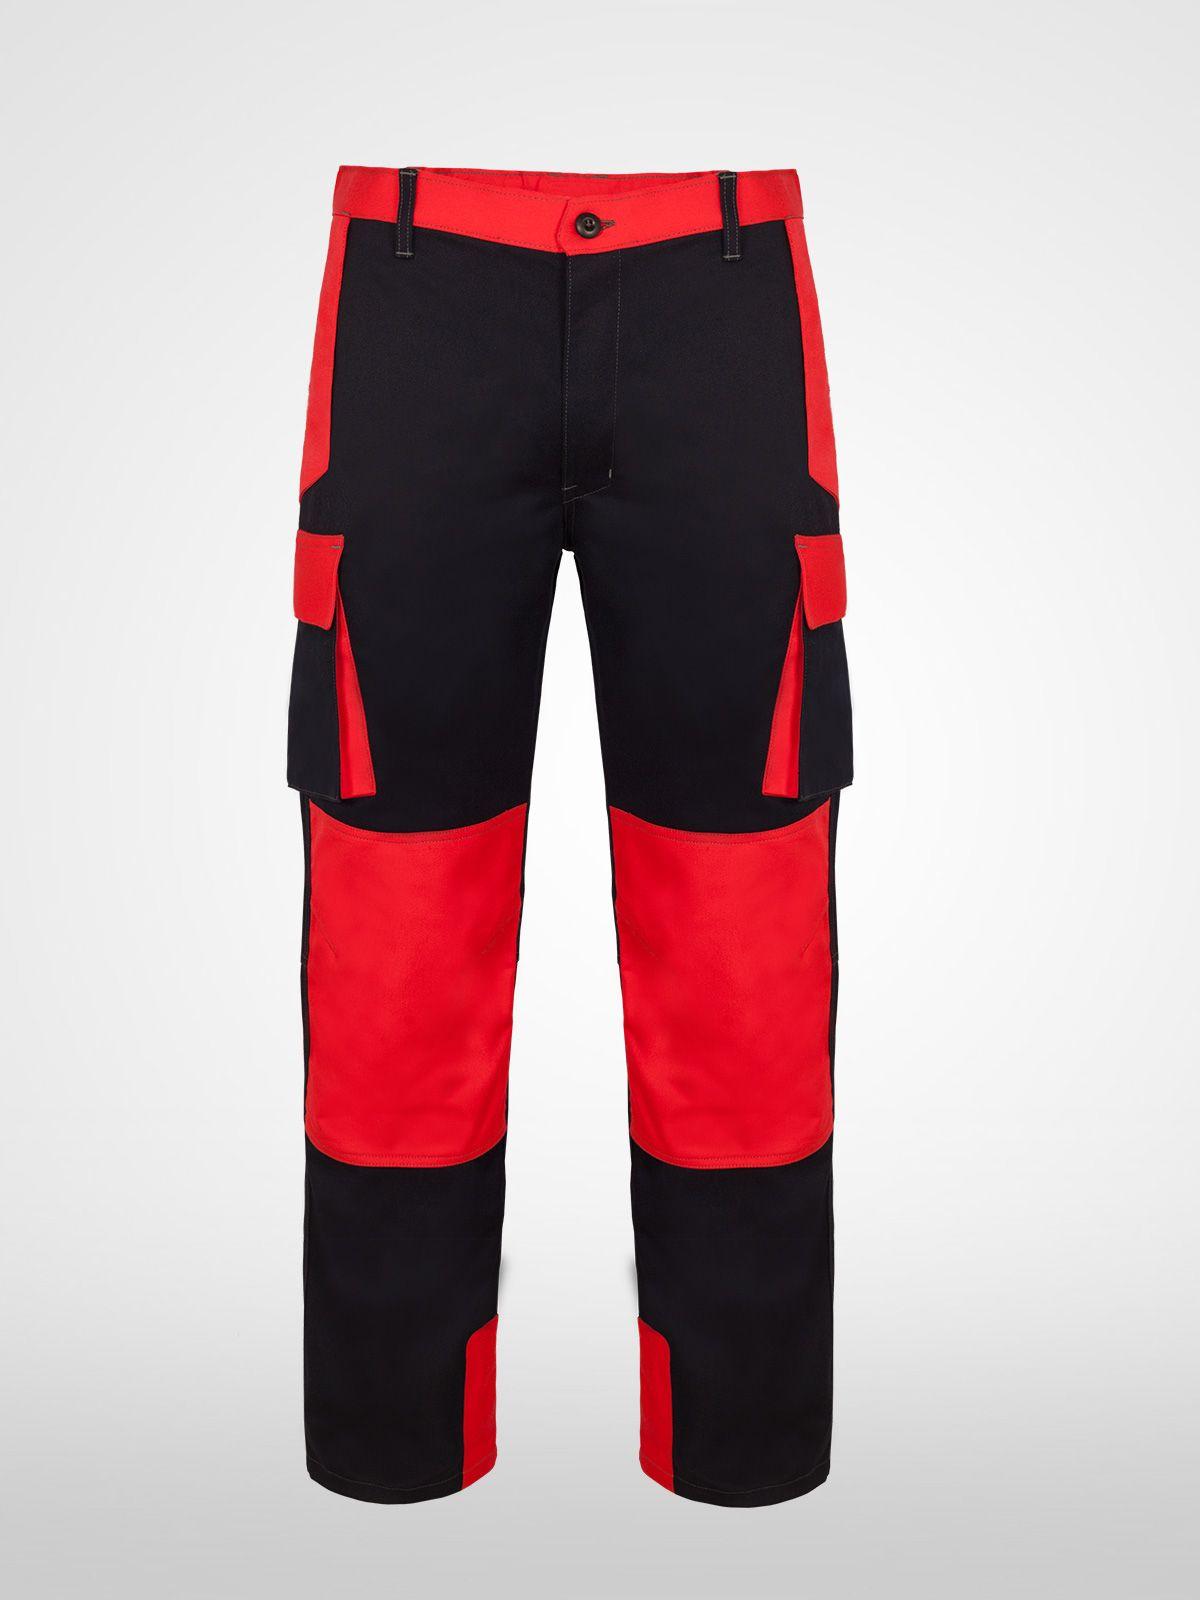 8deef8f9817f Tarasafe Flame Resistant Trousers  FRClothing  FRTrousers  Tarasafe ...